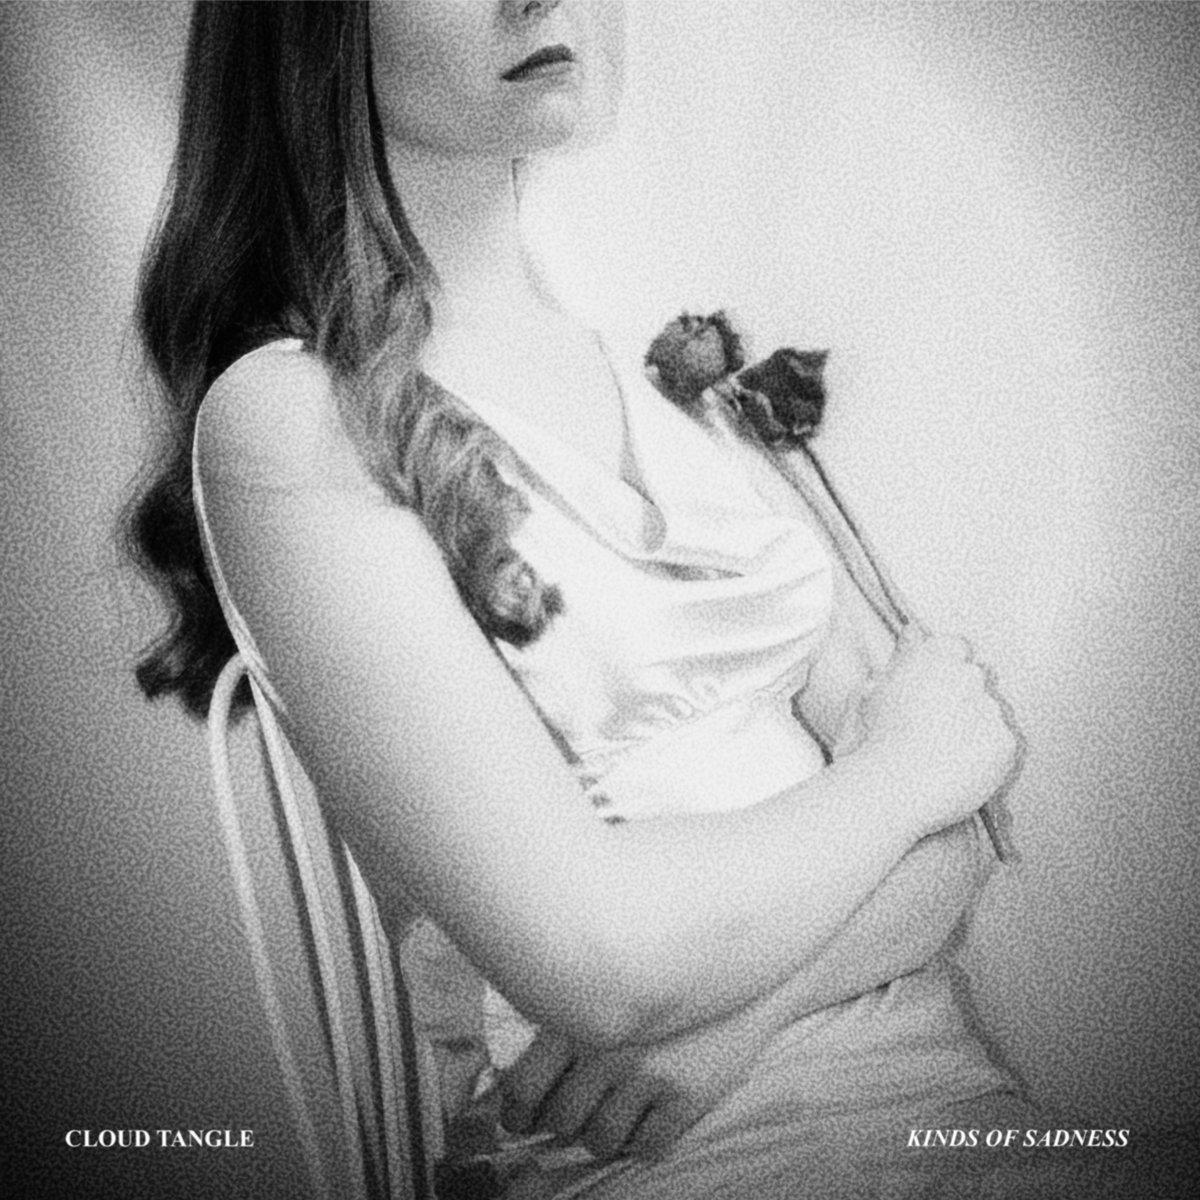 Cloud Tangle – Kinds Of Sadness